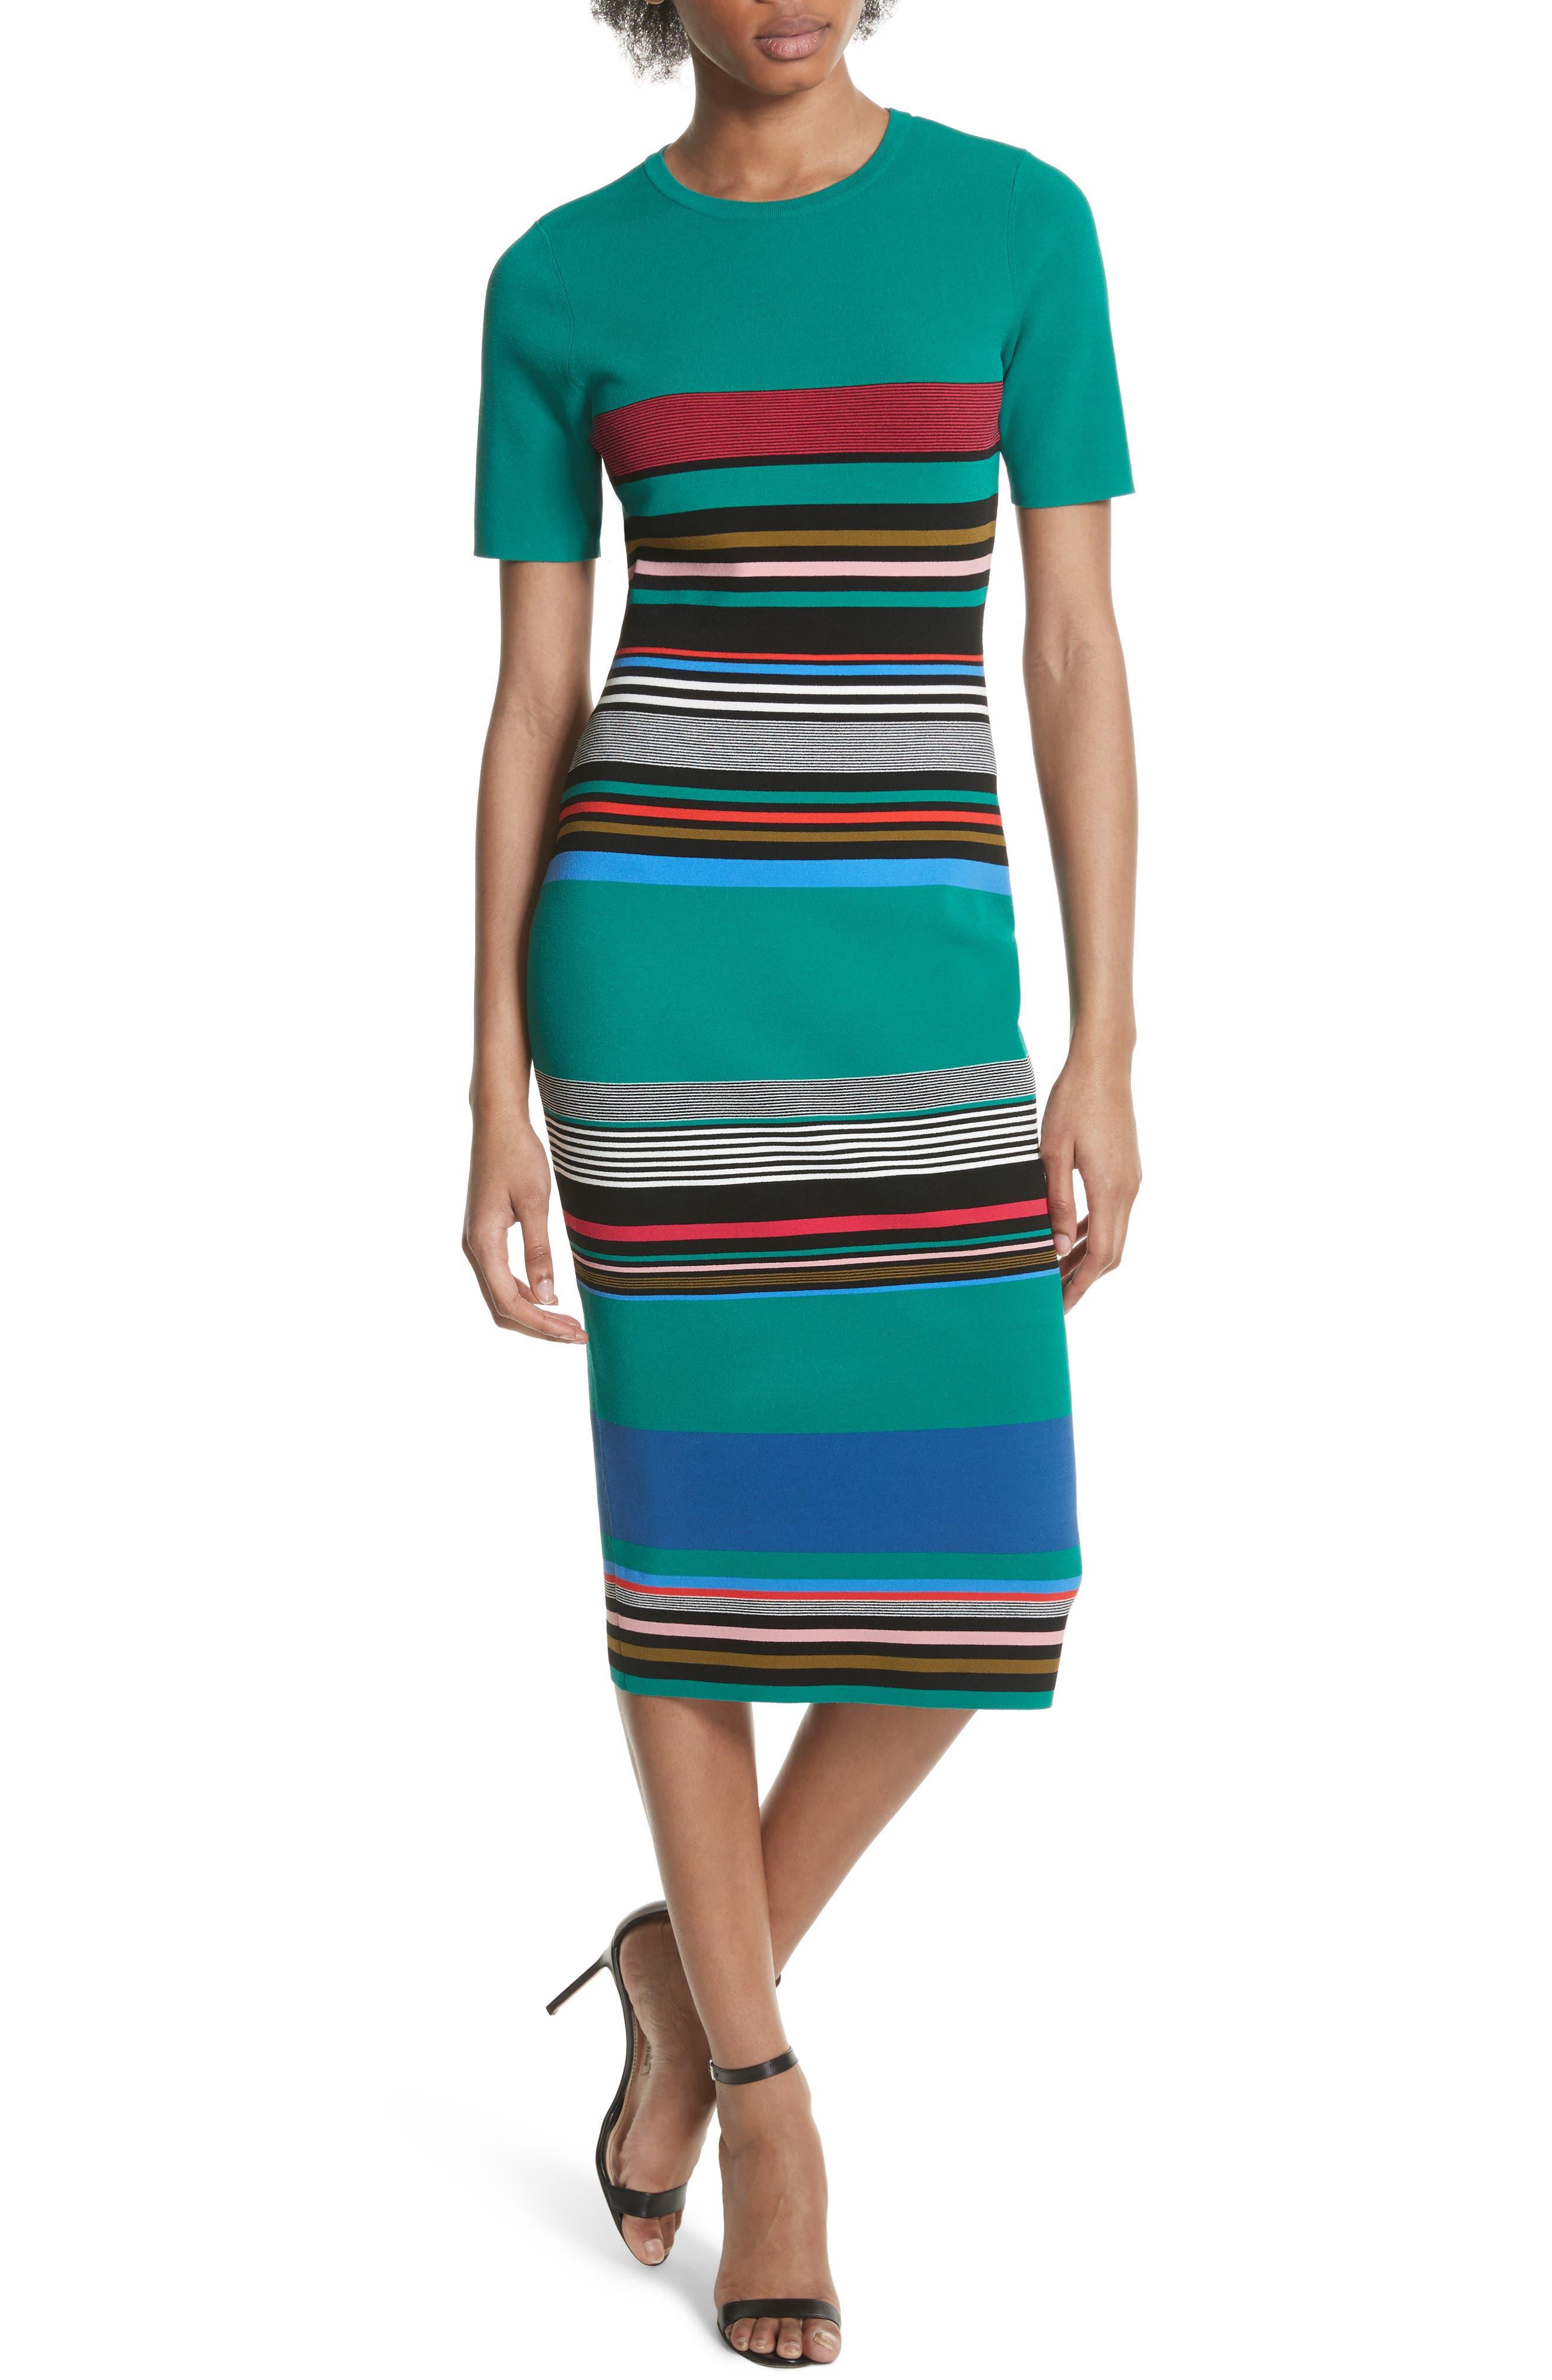 Diane von Furstenberg Stripe Short Sleeve Sweater Dress,                             Main thumbnail 1, color,                             386